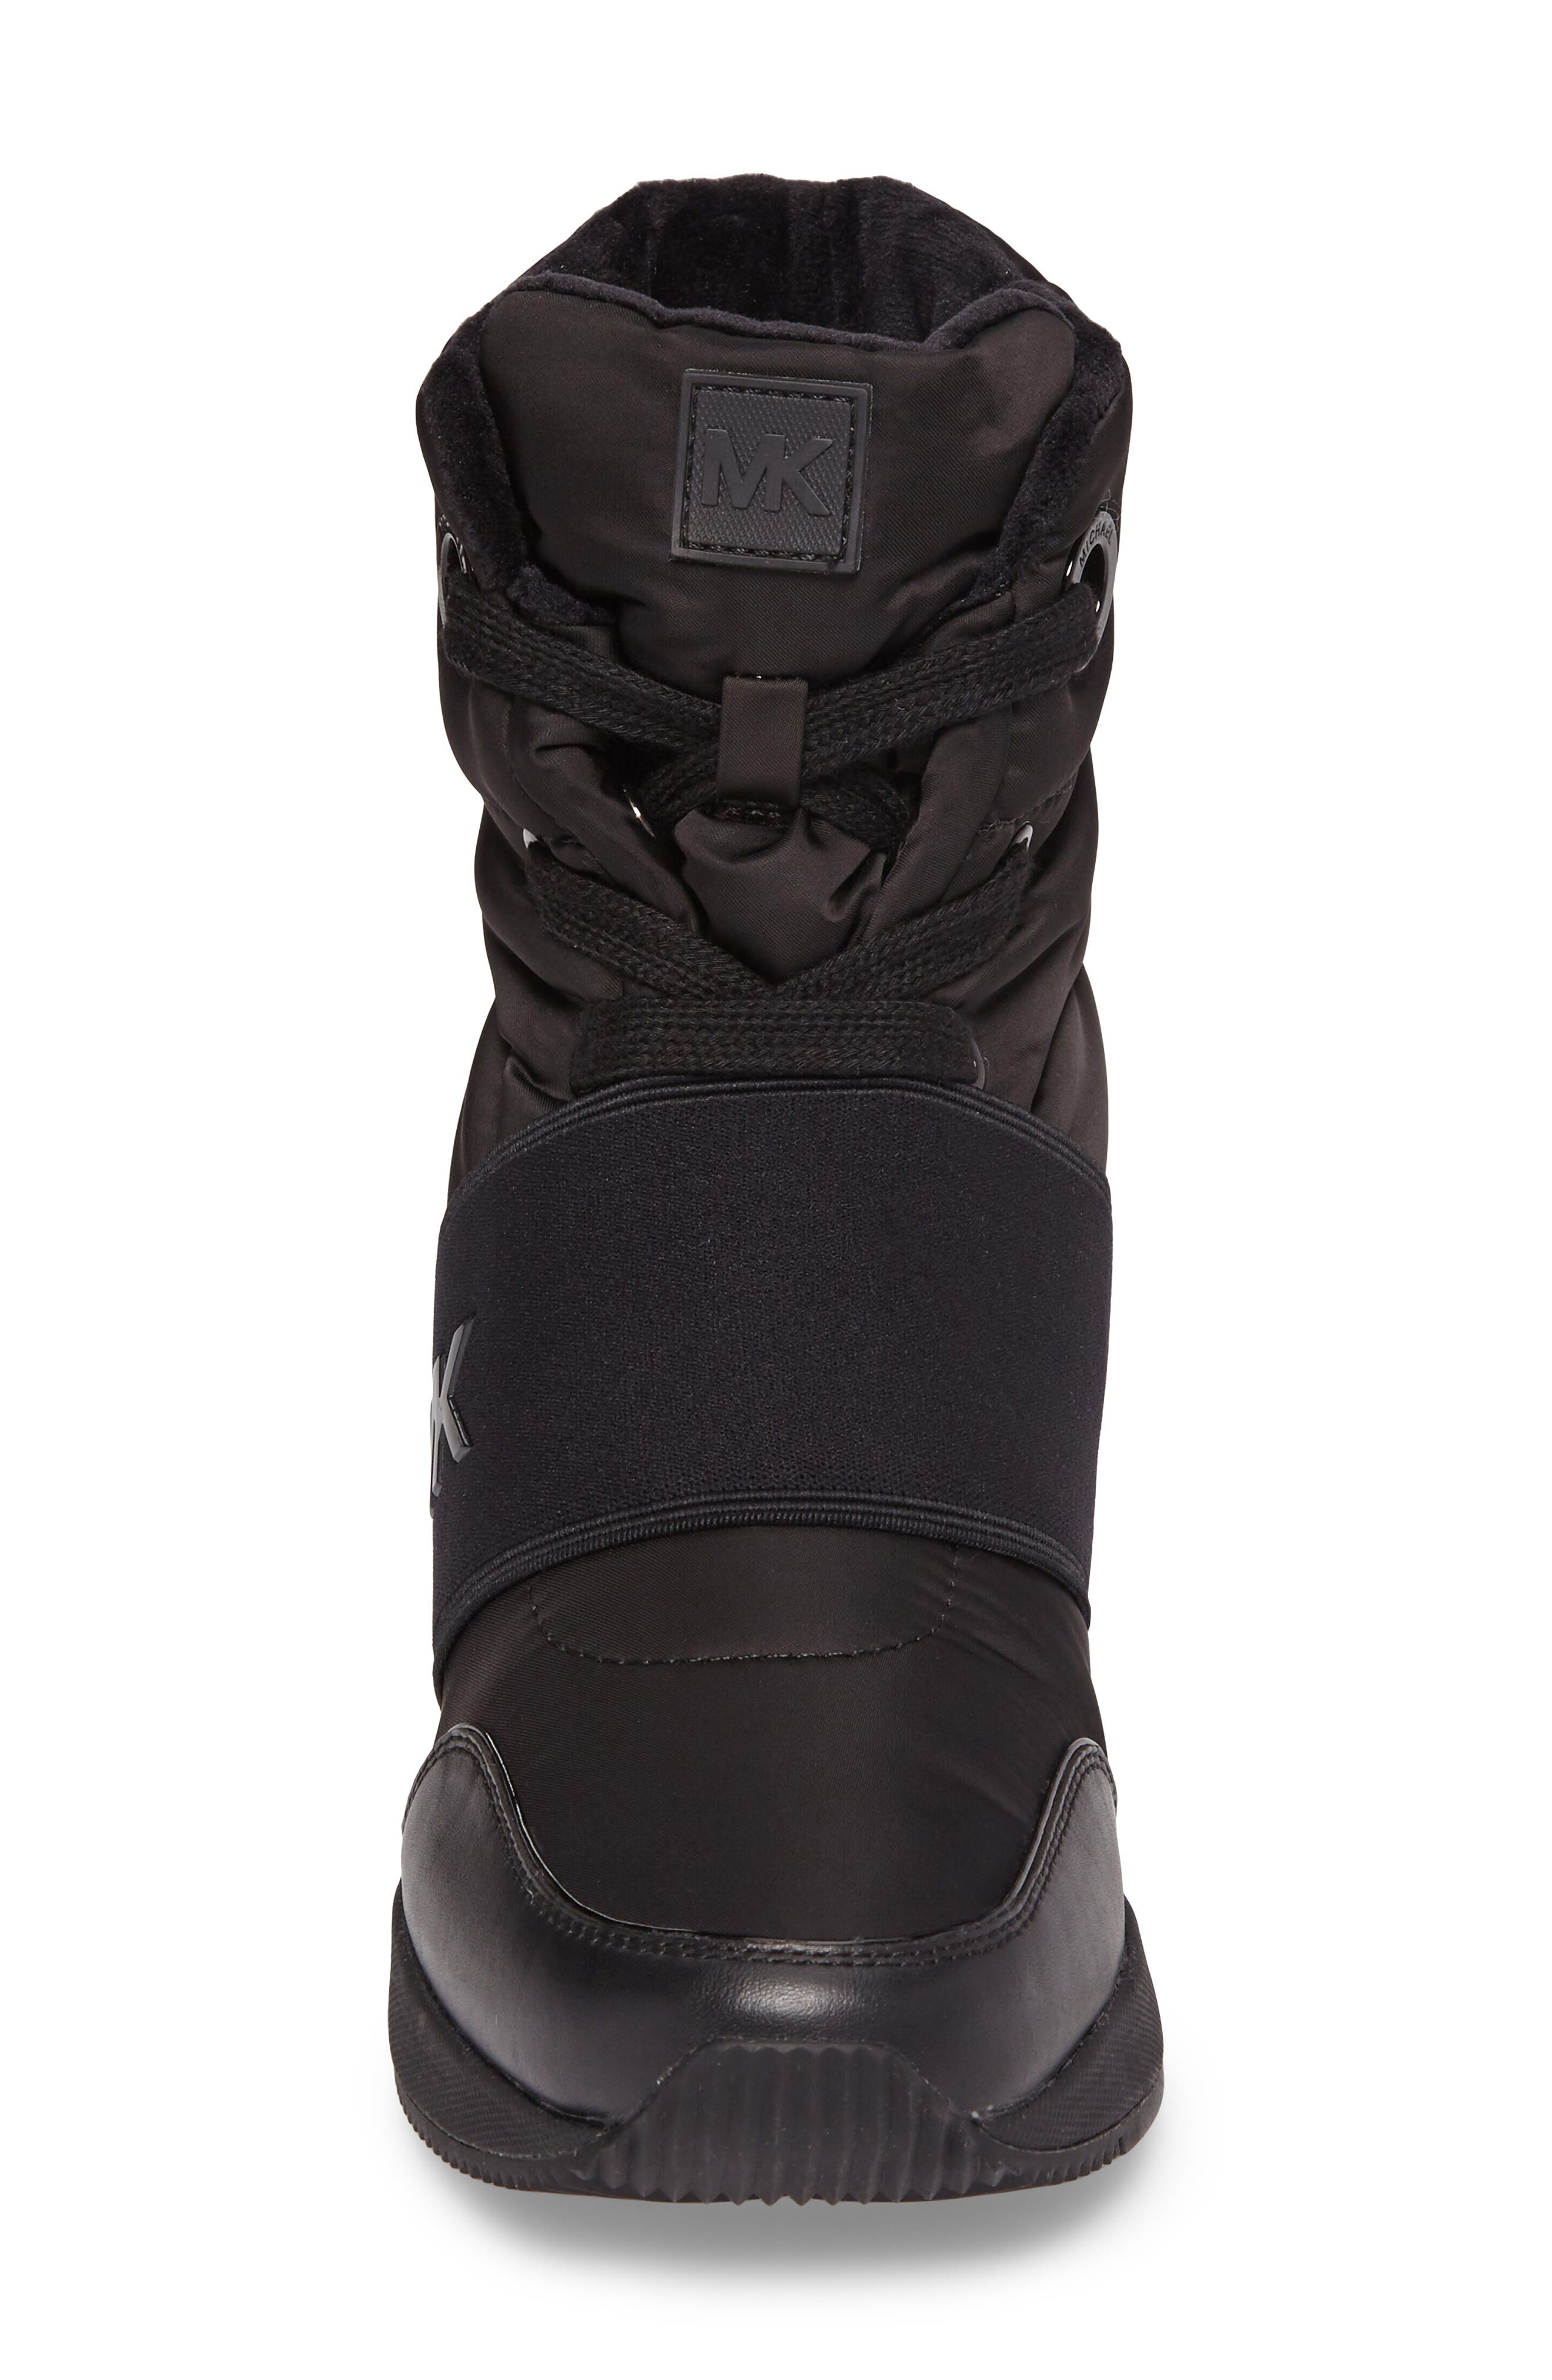 Shay Wedge Bootie,                             Alternate thumbnail 4, color,                             Black Nylon Fabric